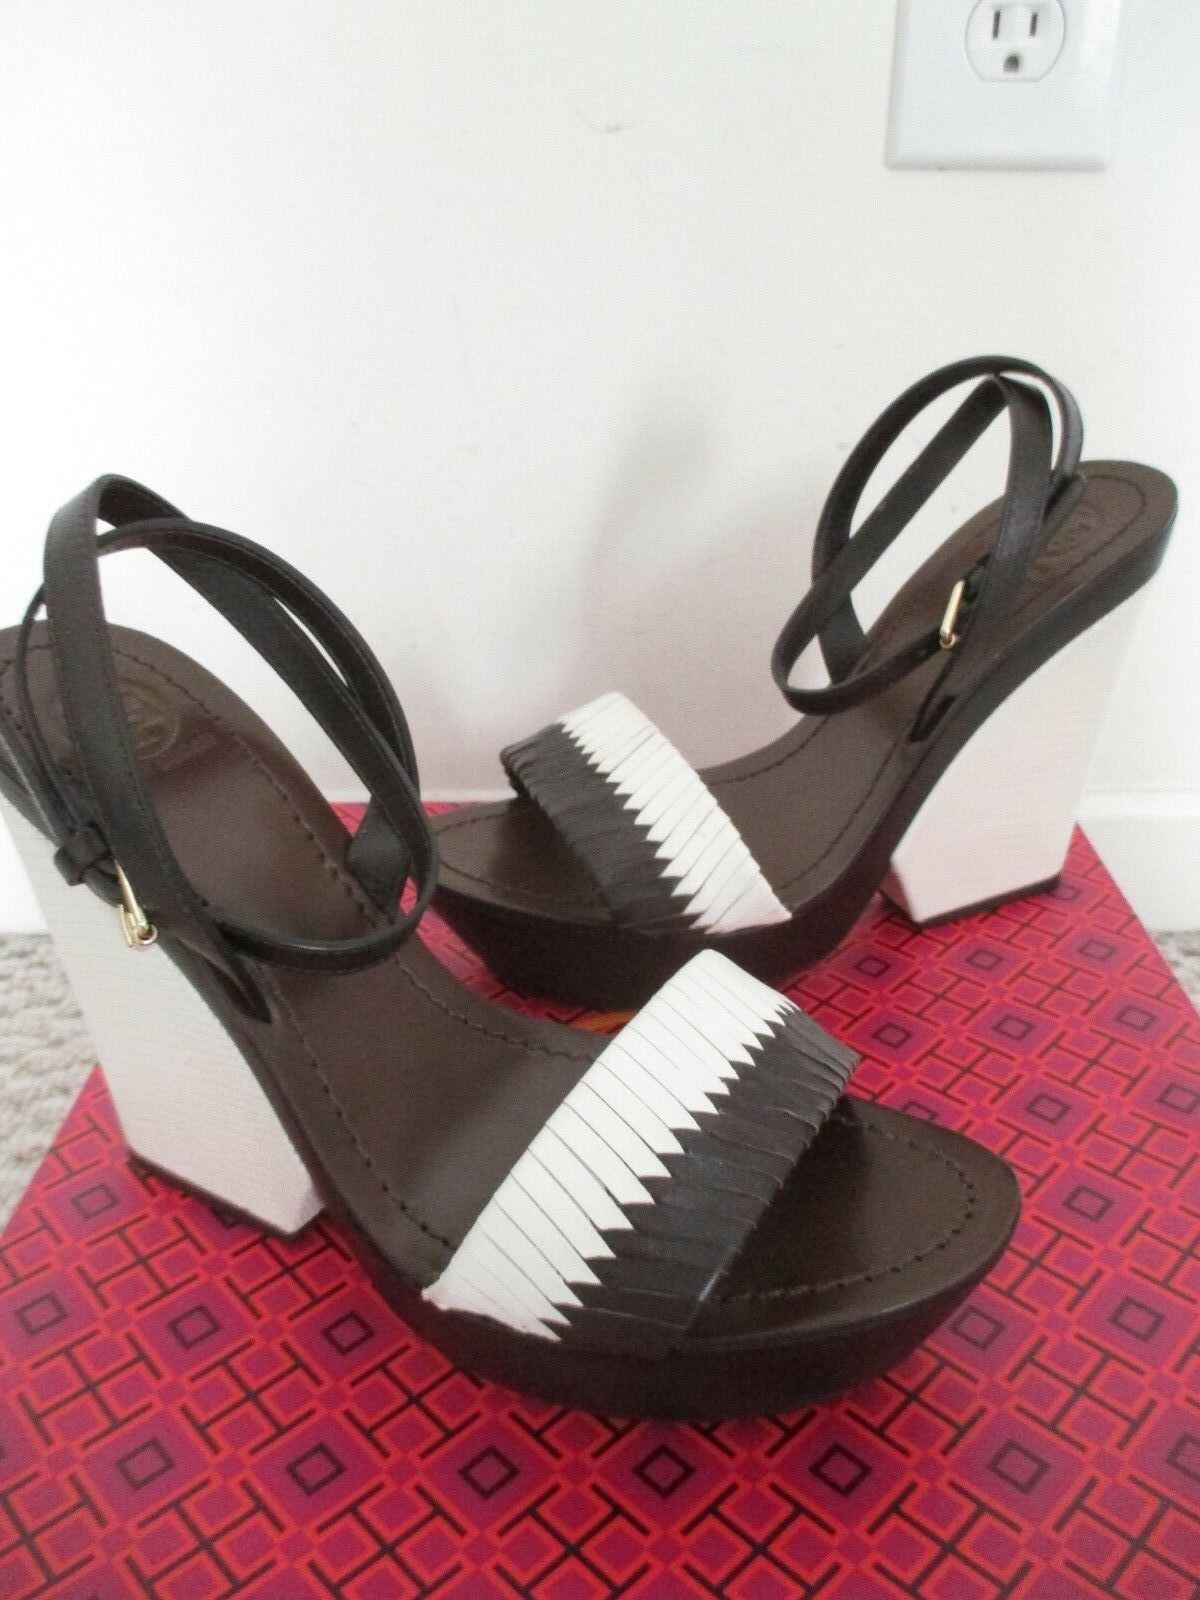 Tory Burch Bi-color Woven Wedge Ivory Coconut Size 9  Platform Sandals   395.00